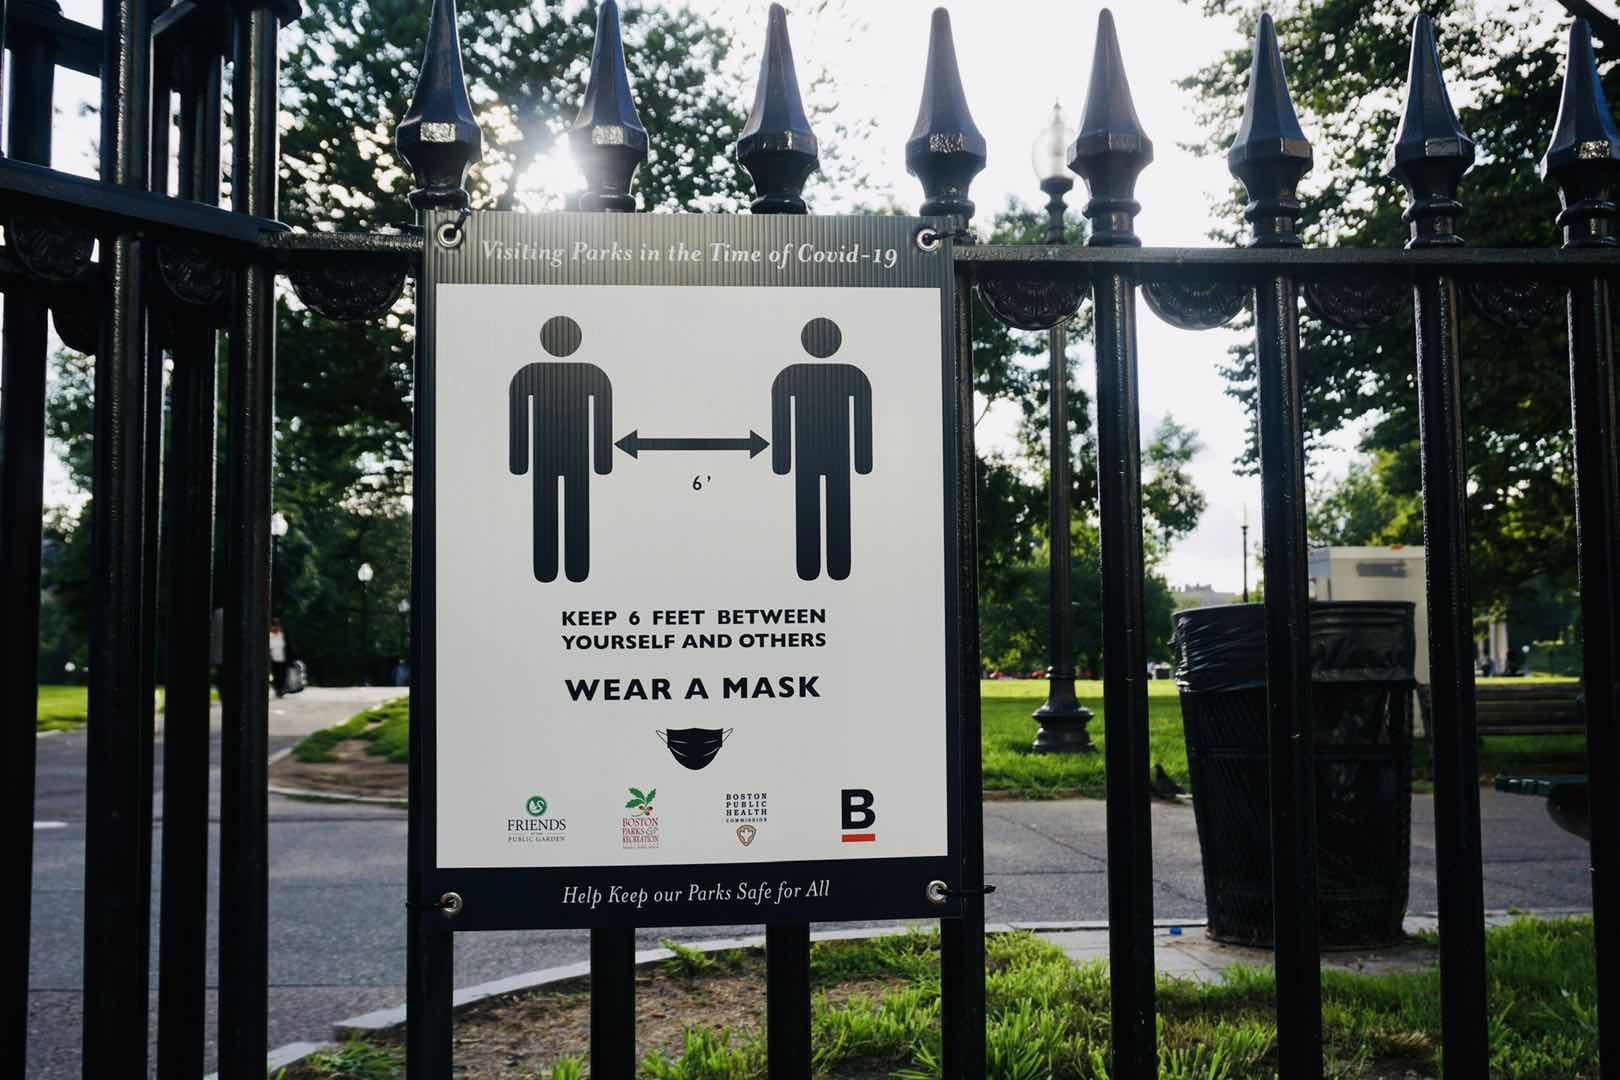 allbet gaming开户:美国病毒专家:佩带口罩可以削减7万人的殒命 第1张